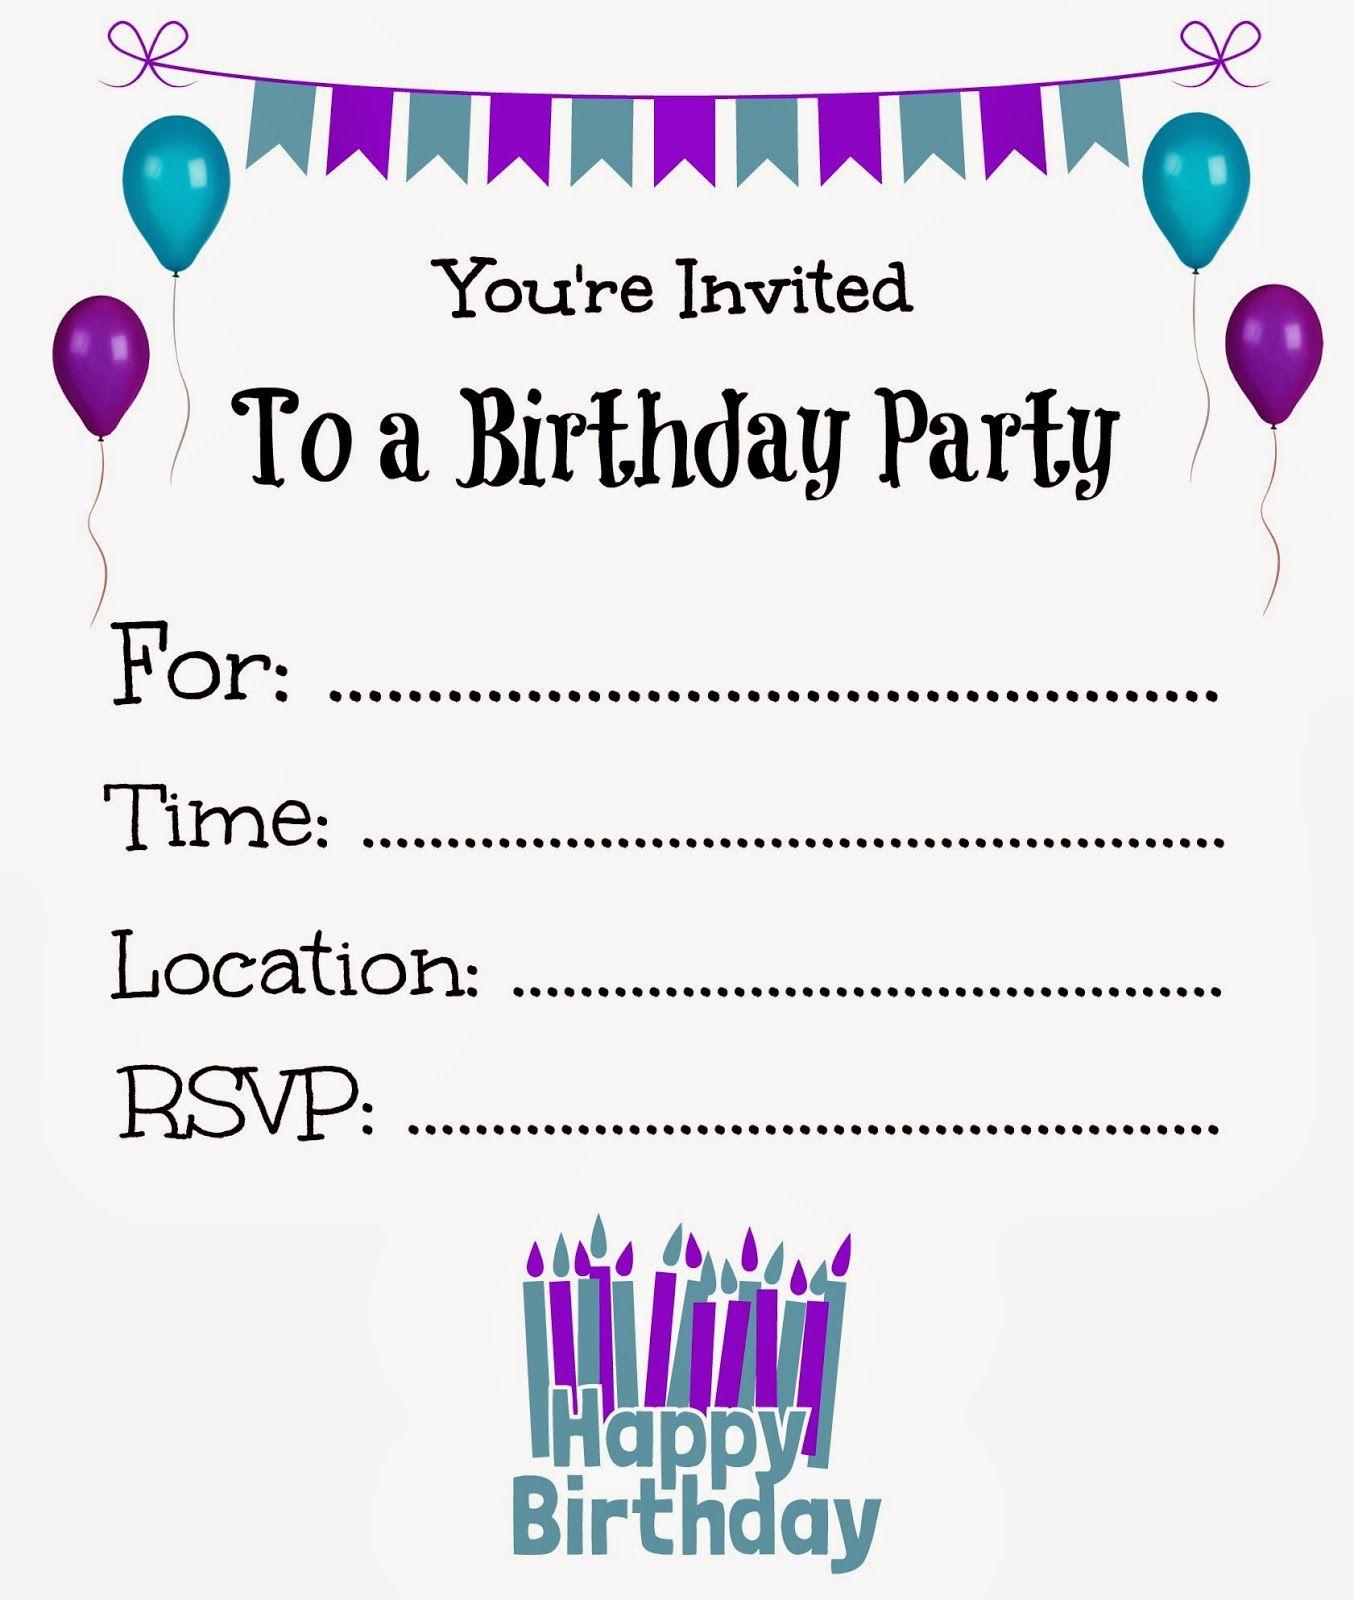 Free Printable Birthday Invitations For Kids #freeprintables - Free Printable Birthday Invitation Cards Templates